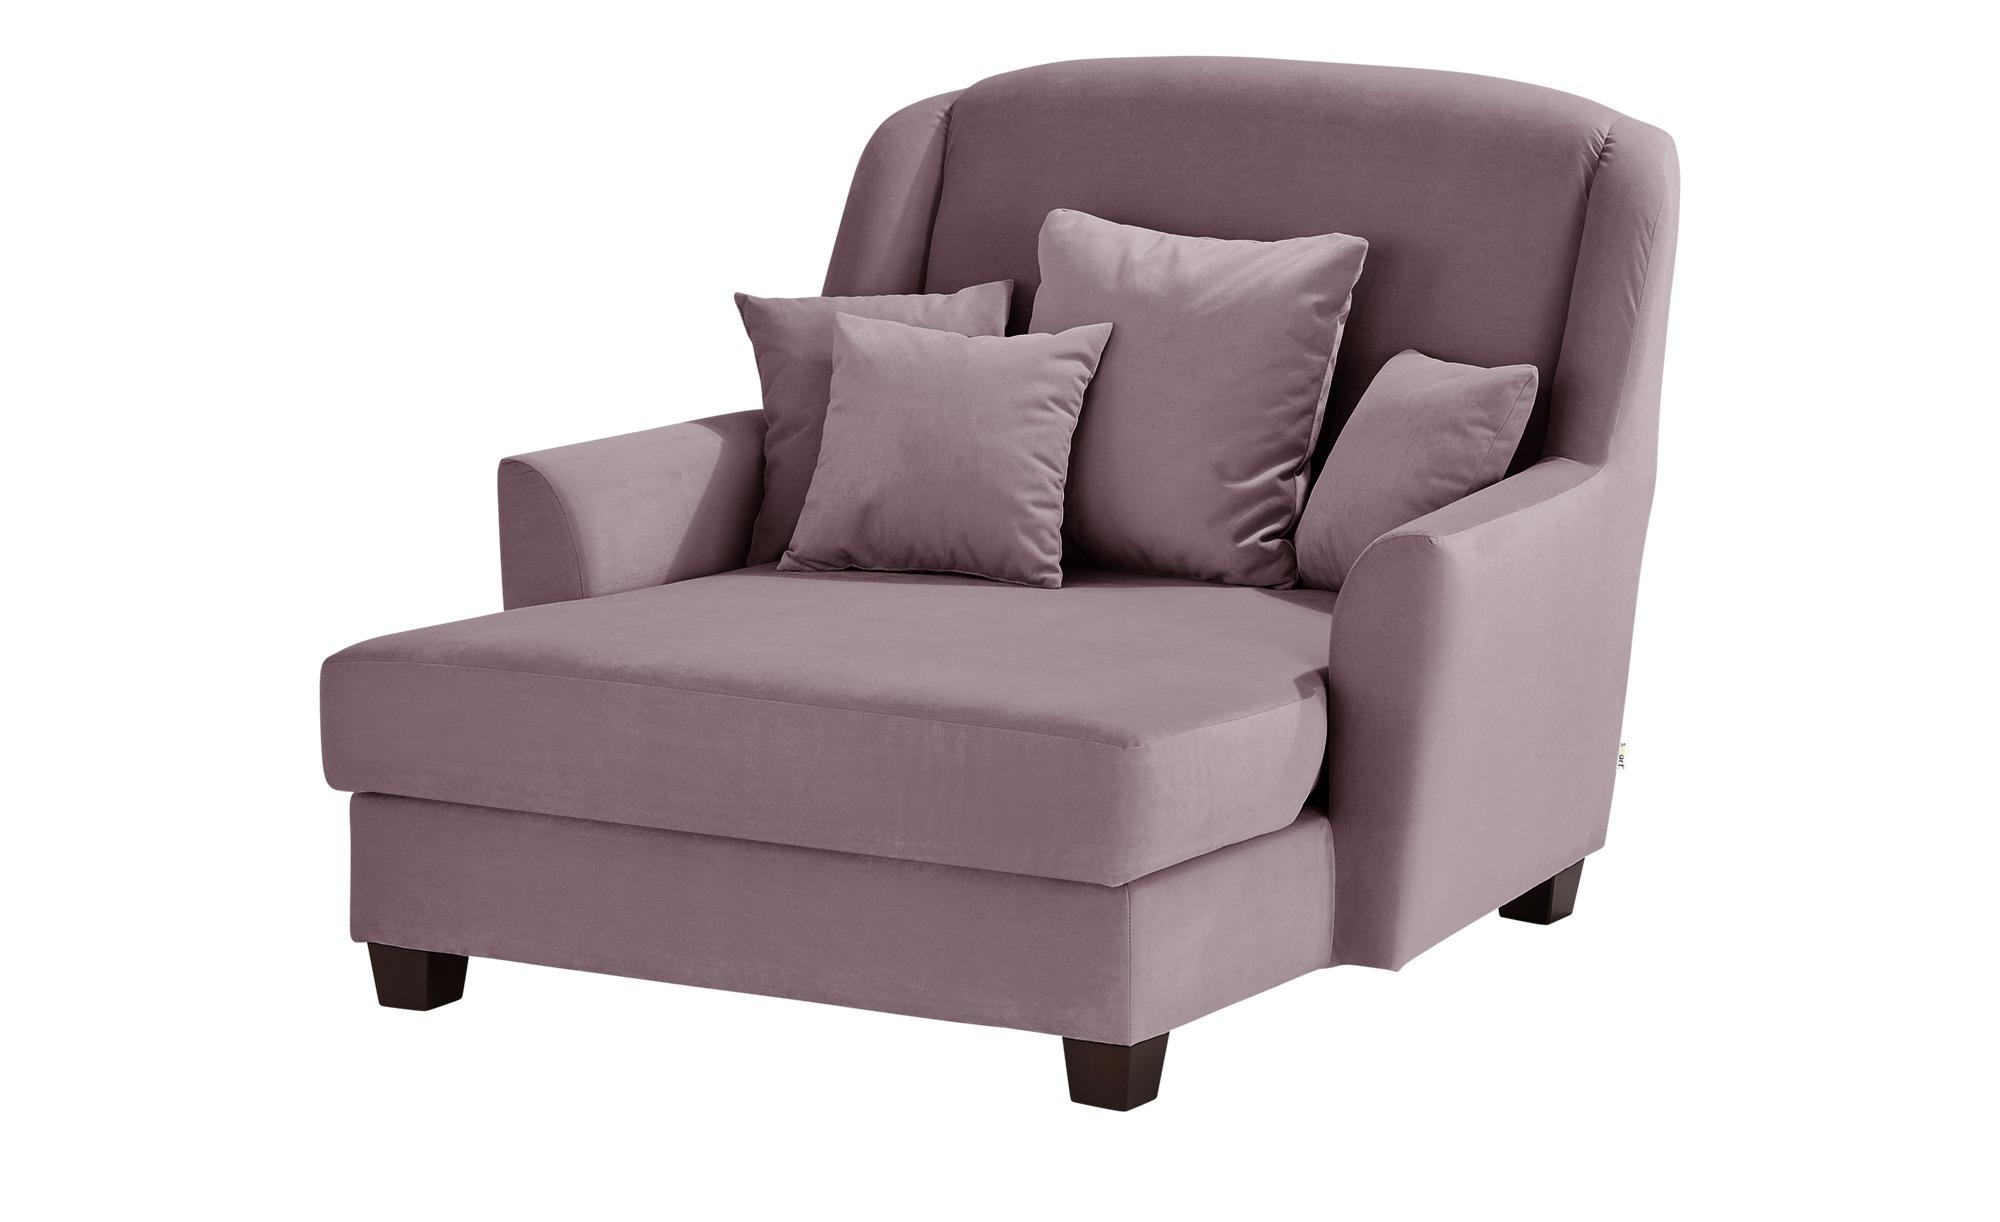 smart Sessel  Lisbeth ¦ rosa/pink ¦ Maße (cm): B: 135 H: 100 T: 144 Polstermöbel > Sessel > Ohrensessel - Höffner